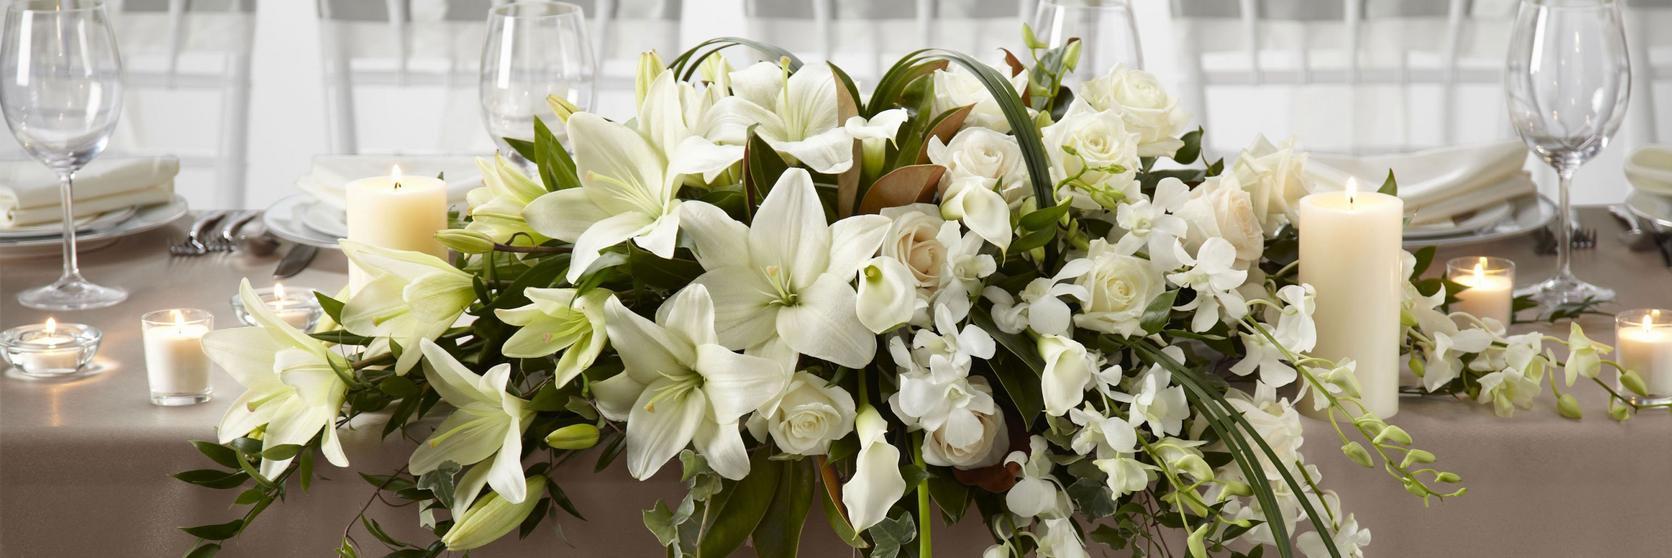 lilies-image7